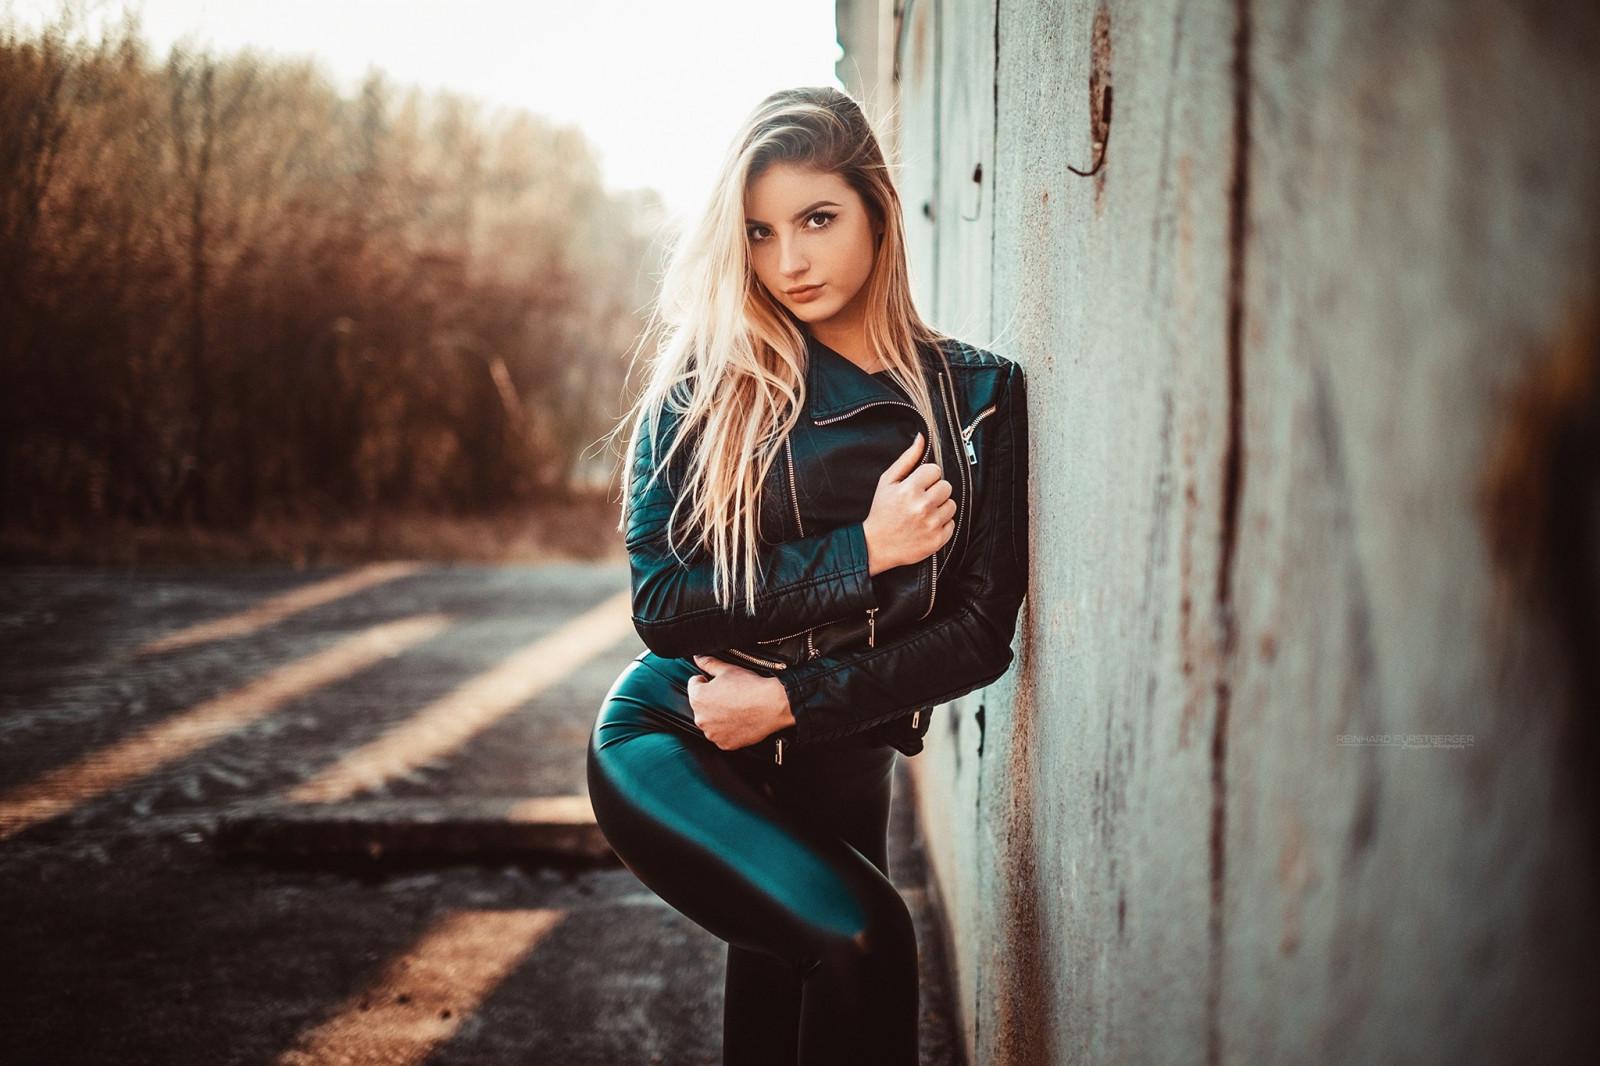 Wallpaper  Sunlight, Women Outdoors, Model, Blonde, Long Hair, Black Clothing, Winter -4208